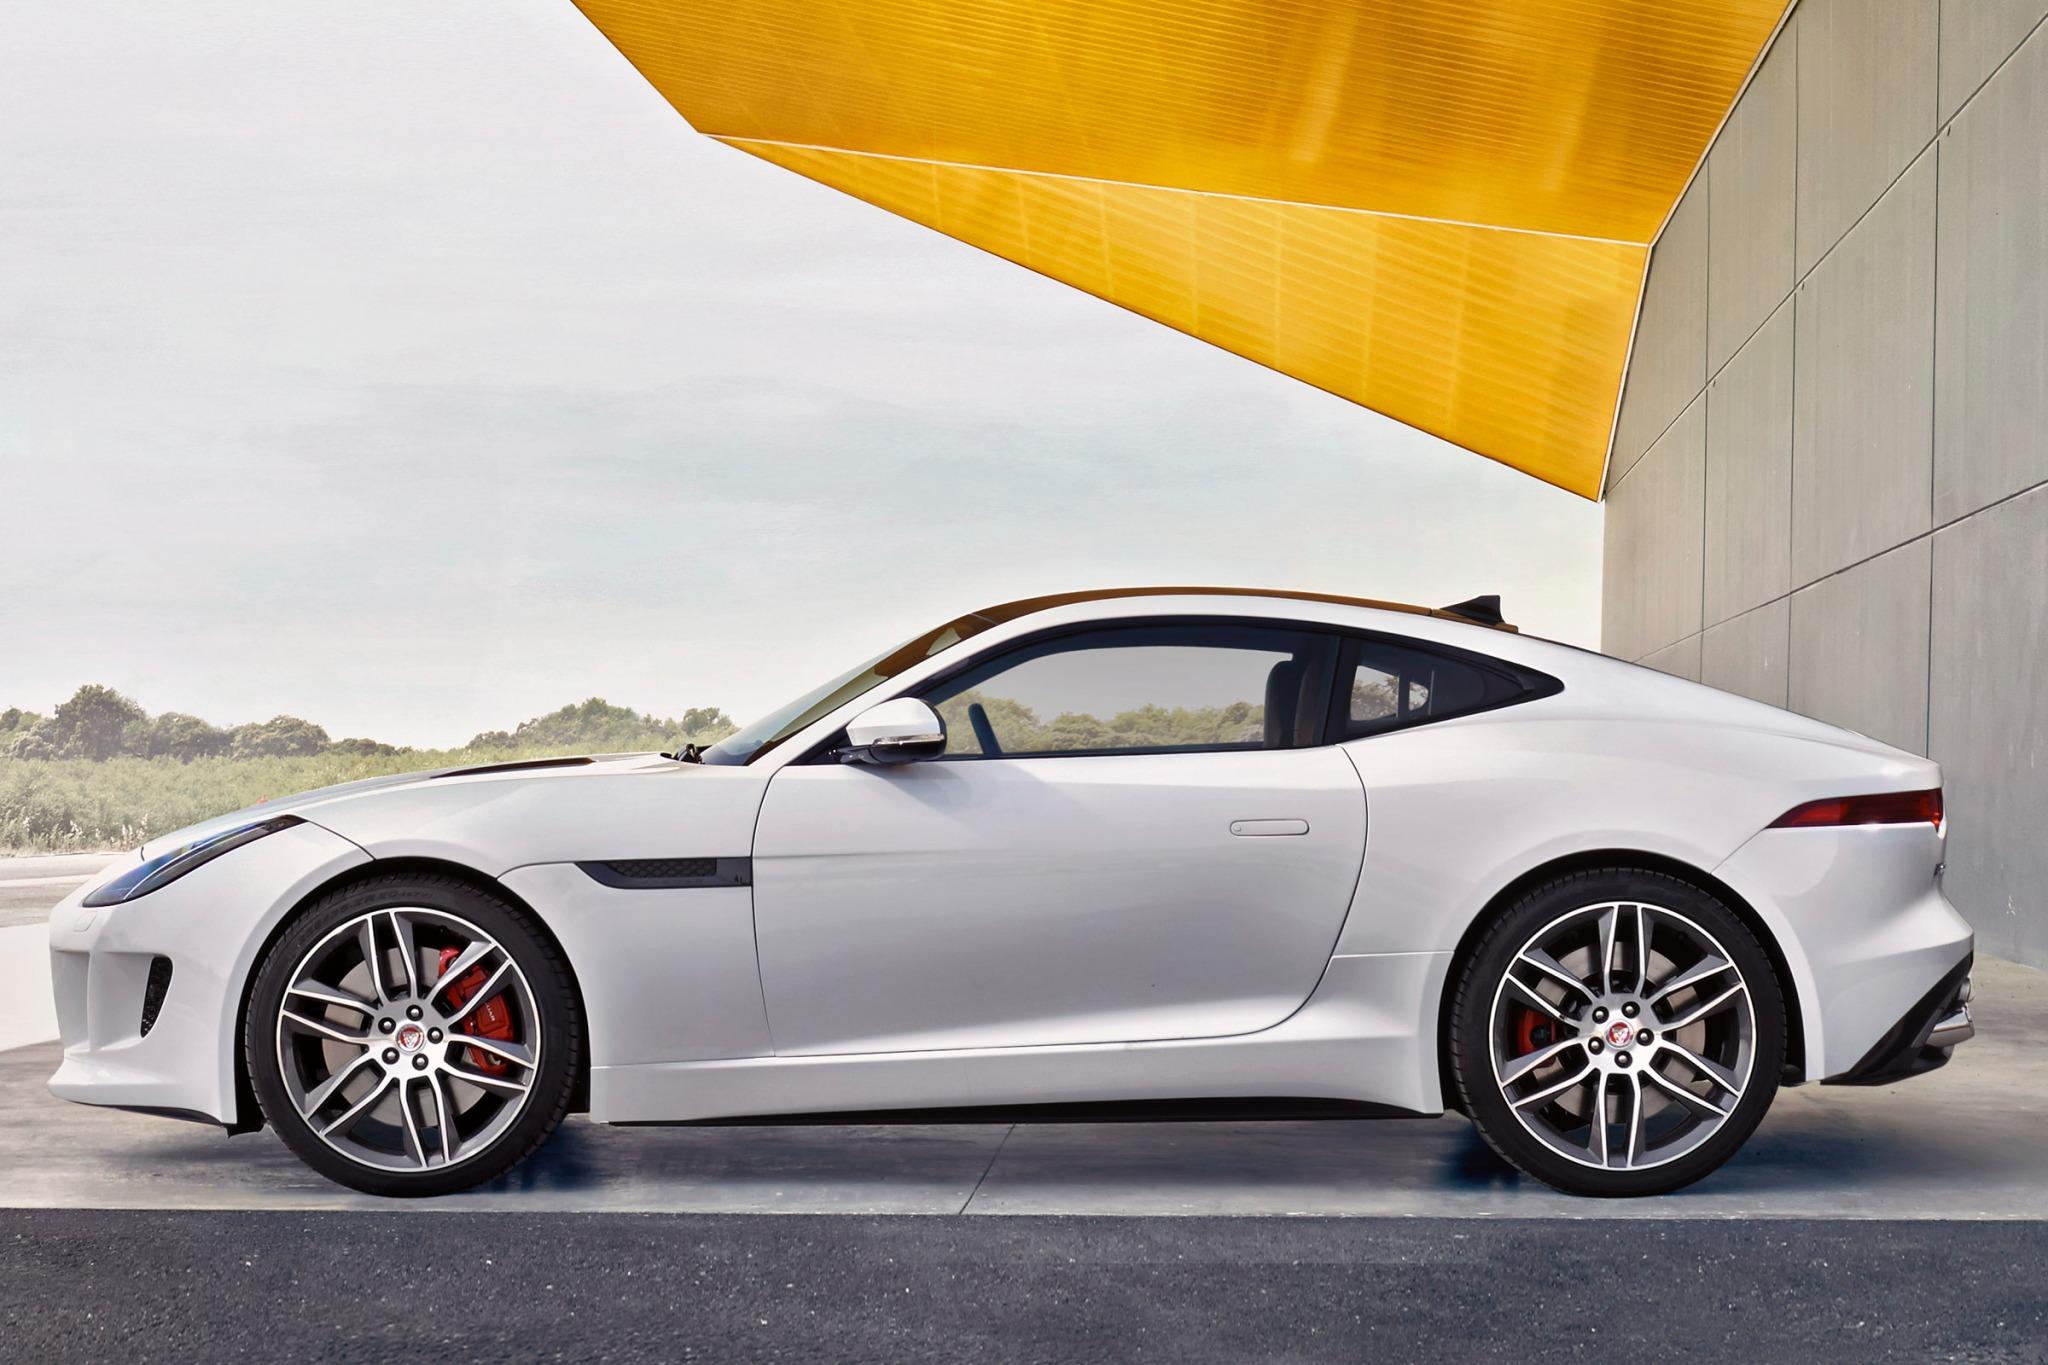 Jaguar F Type S >> 2015 JAGUAR F-TYPE - Image #4